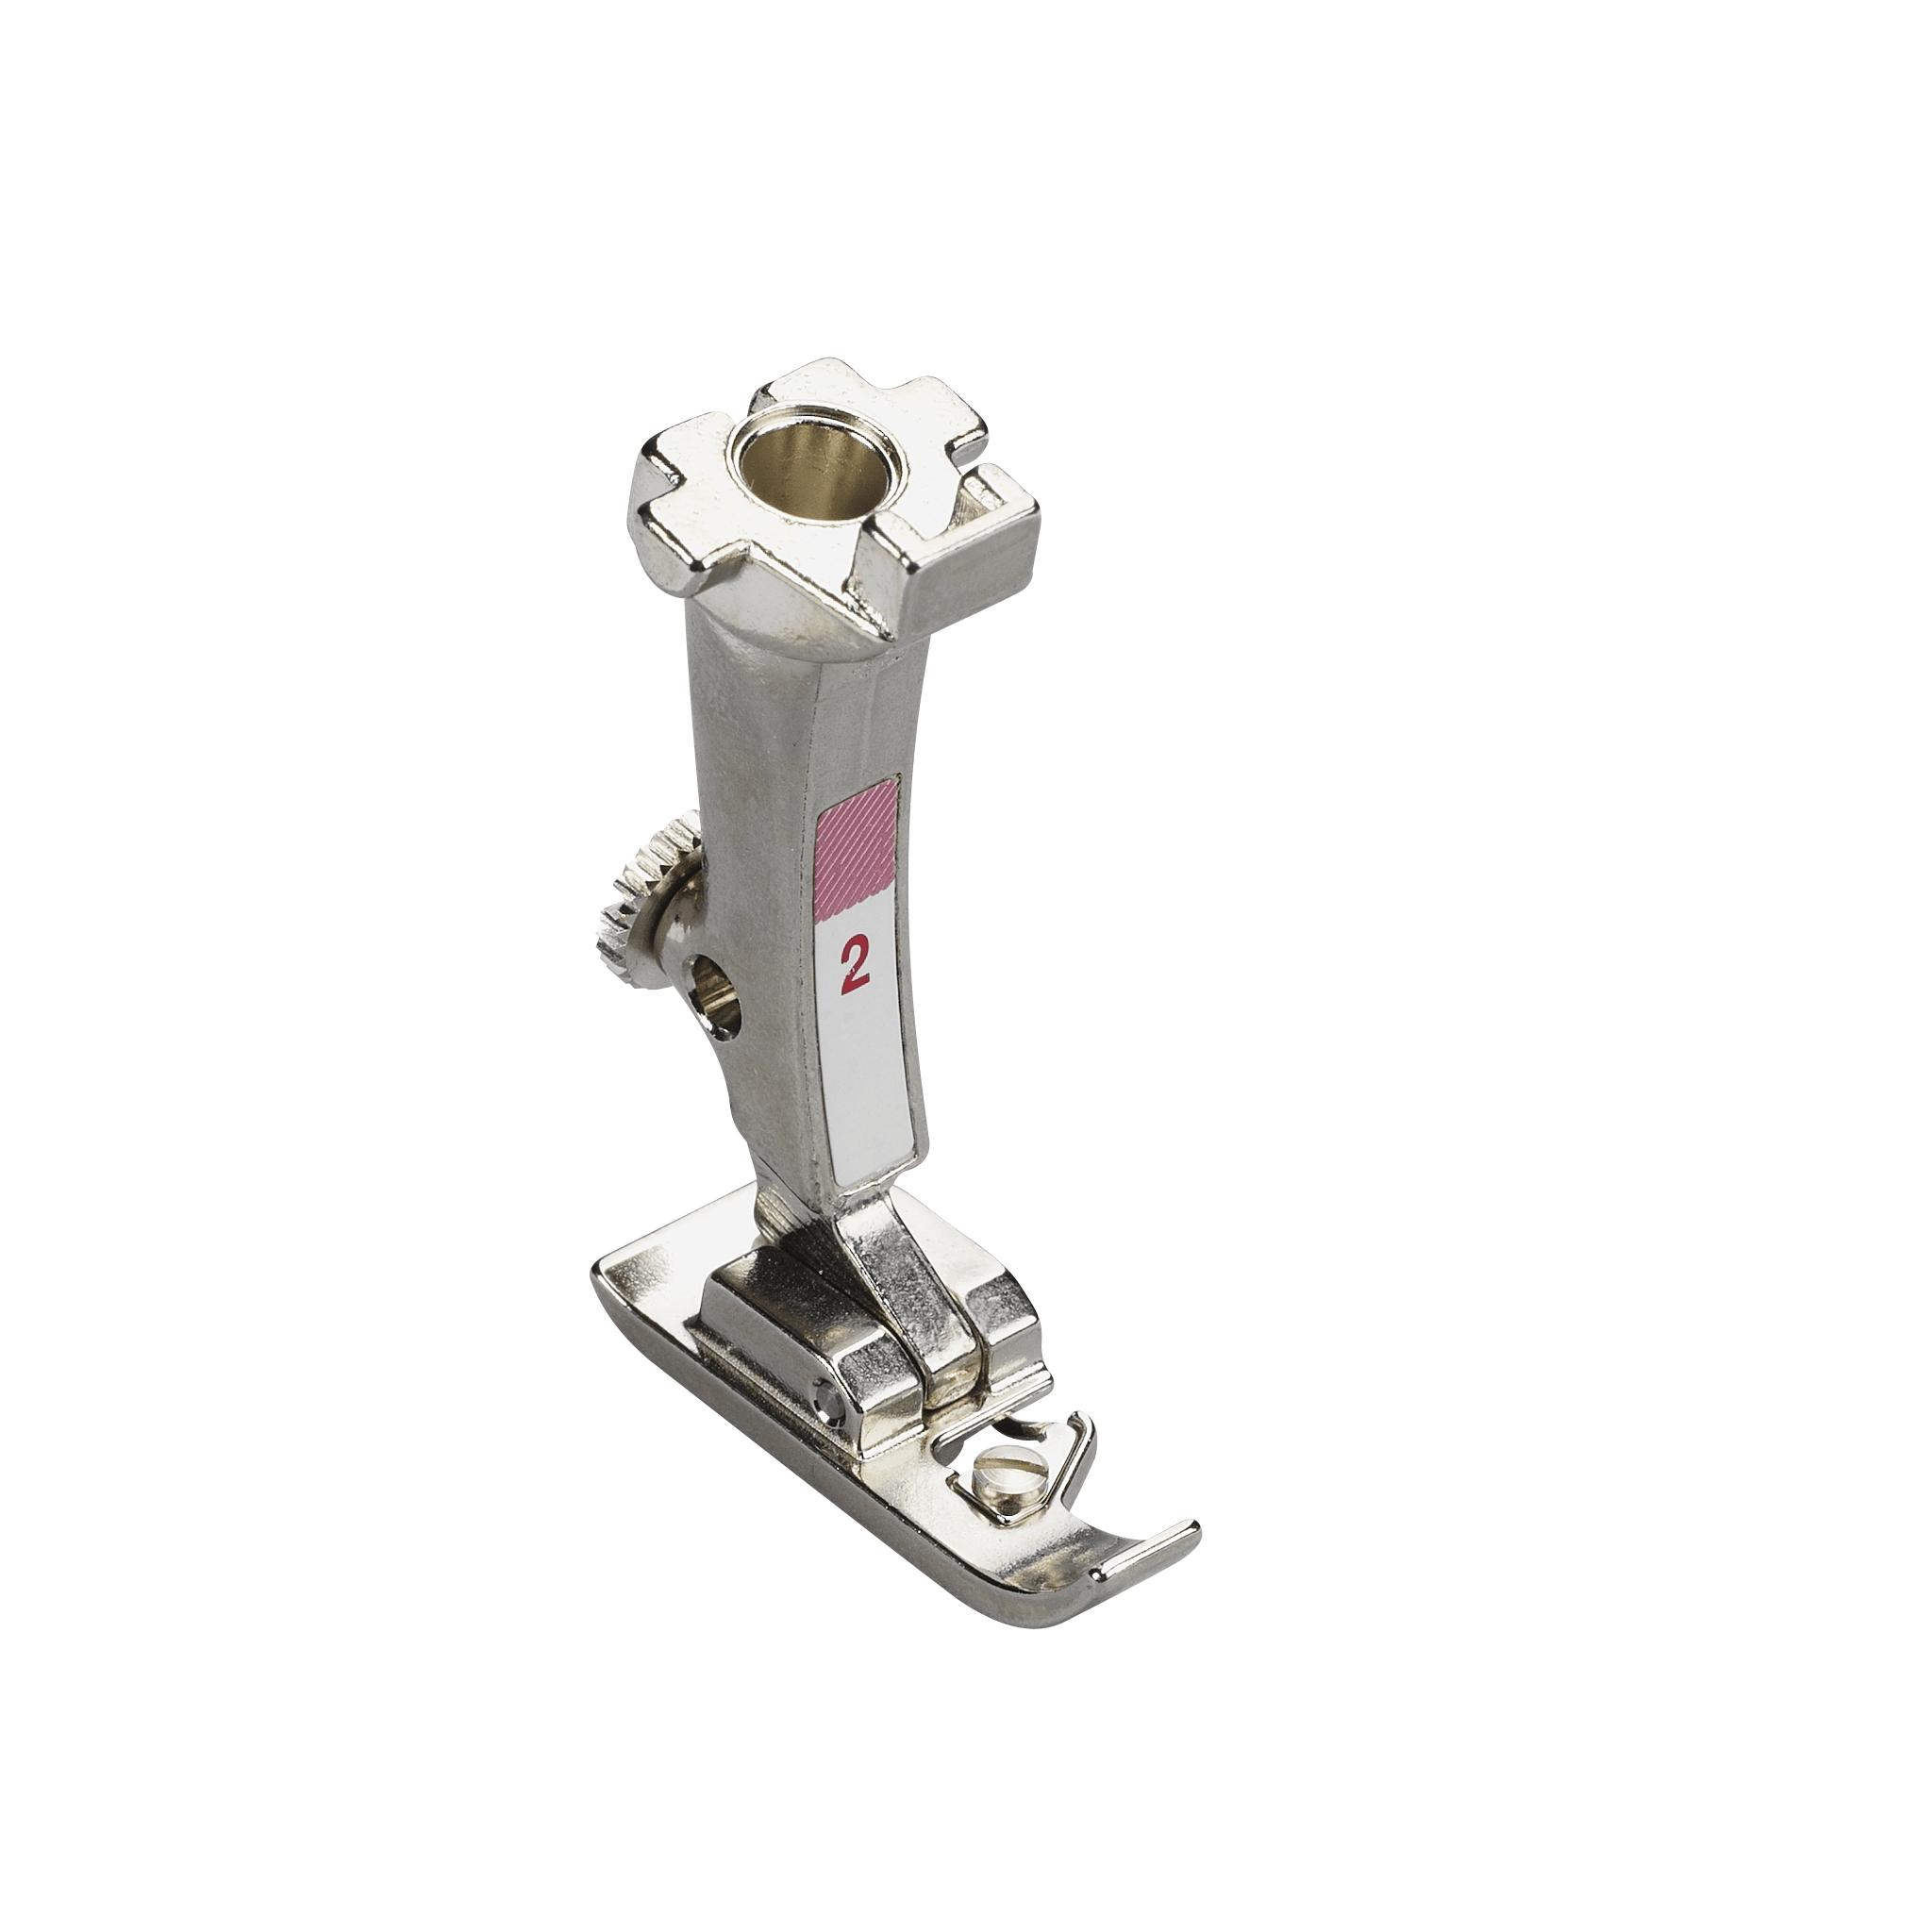 Image of   2 - Overlock Trykfod - 1000 Serien